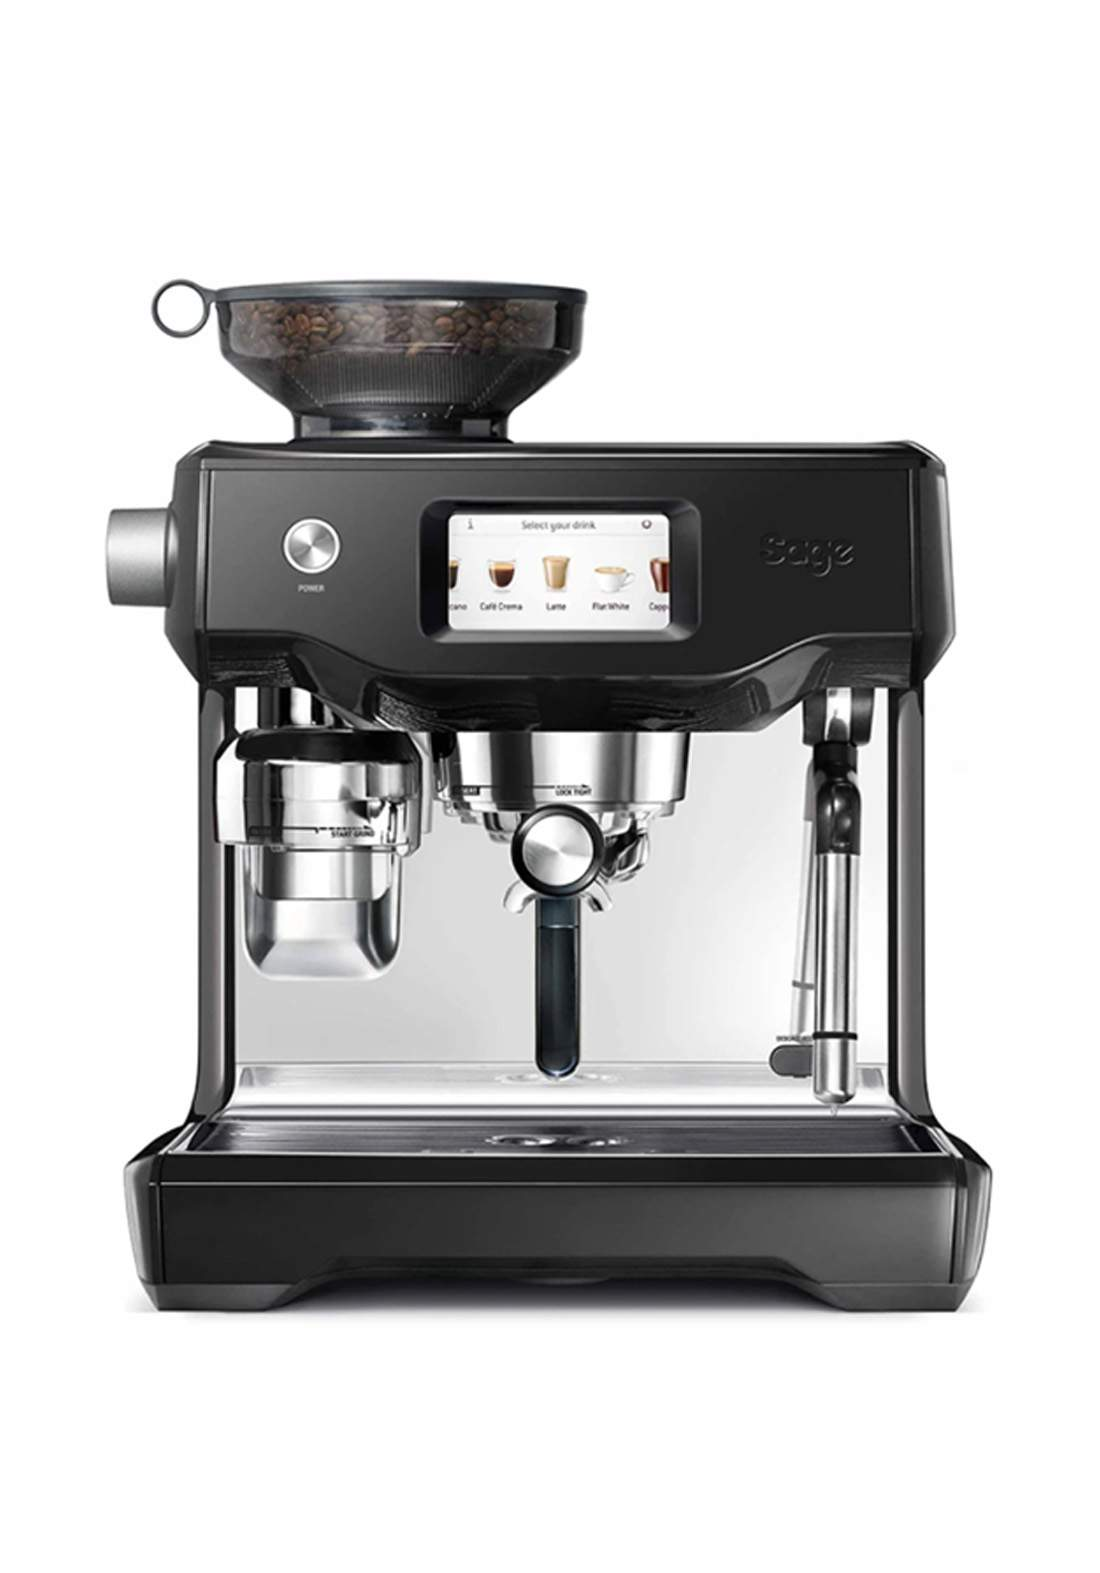 Sage SES880BSS4EEU1 Coffee Machine 2400 Watt ماكنة صنع قهوة